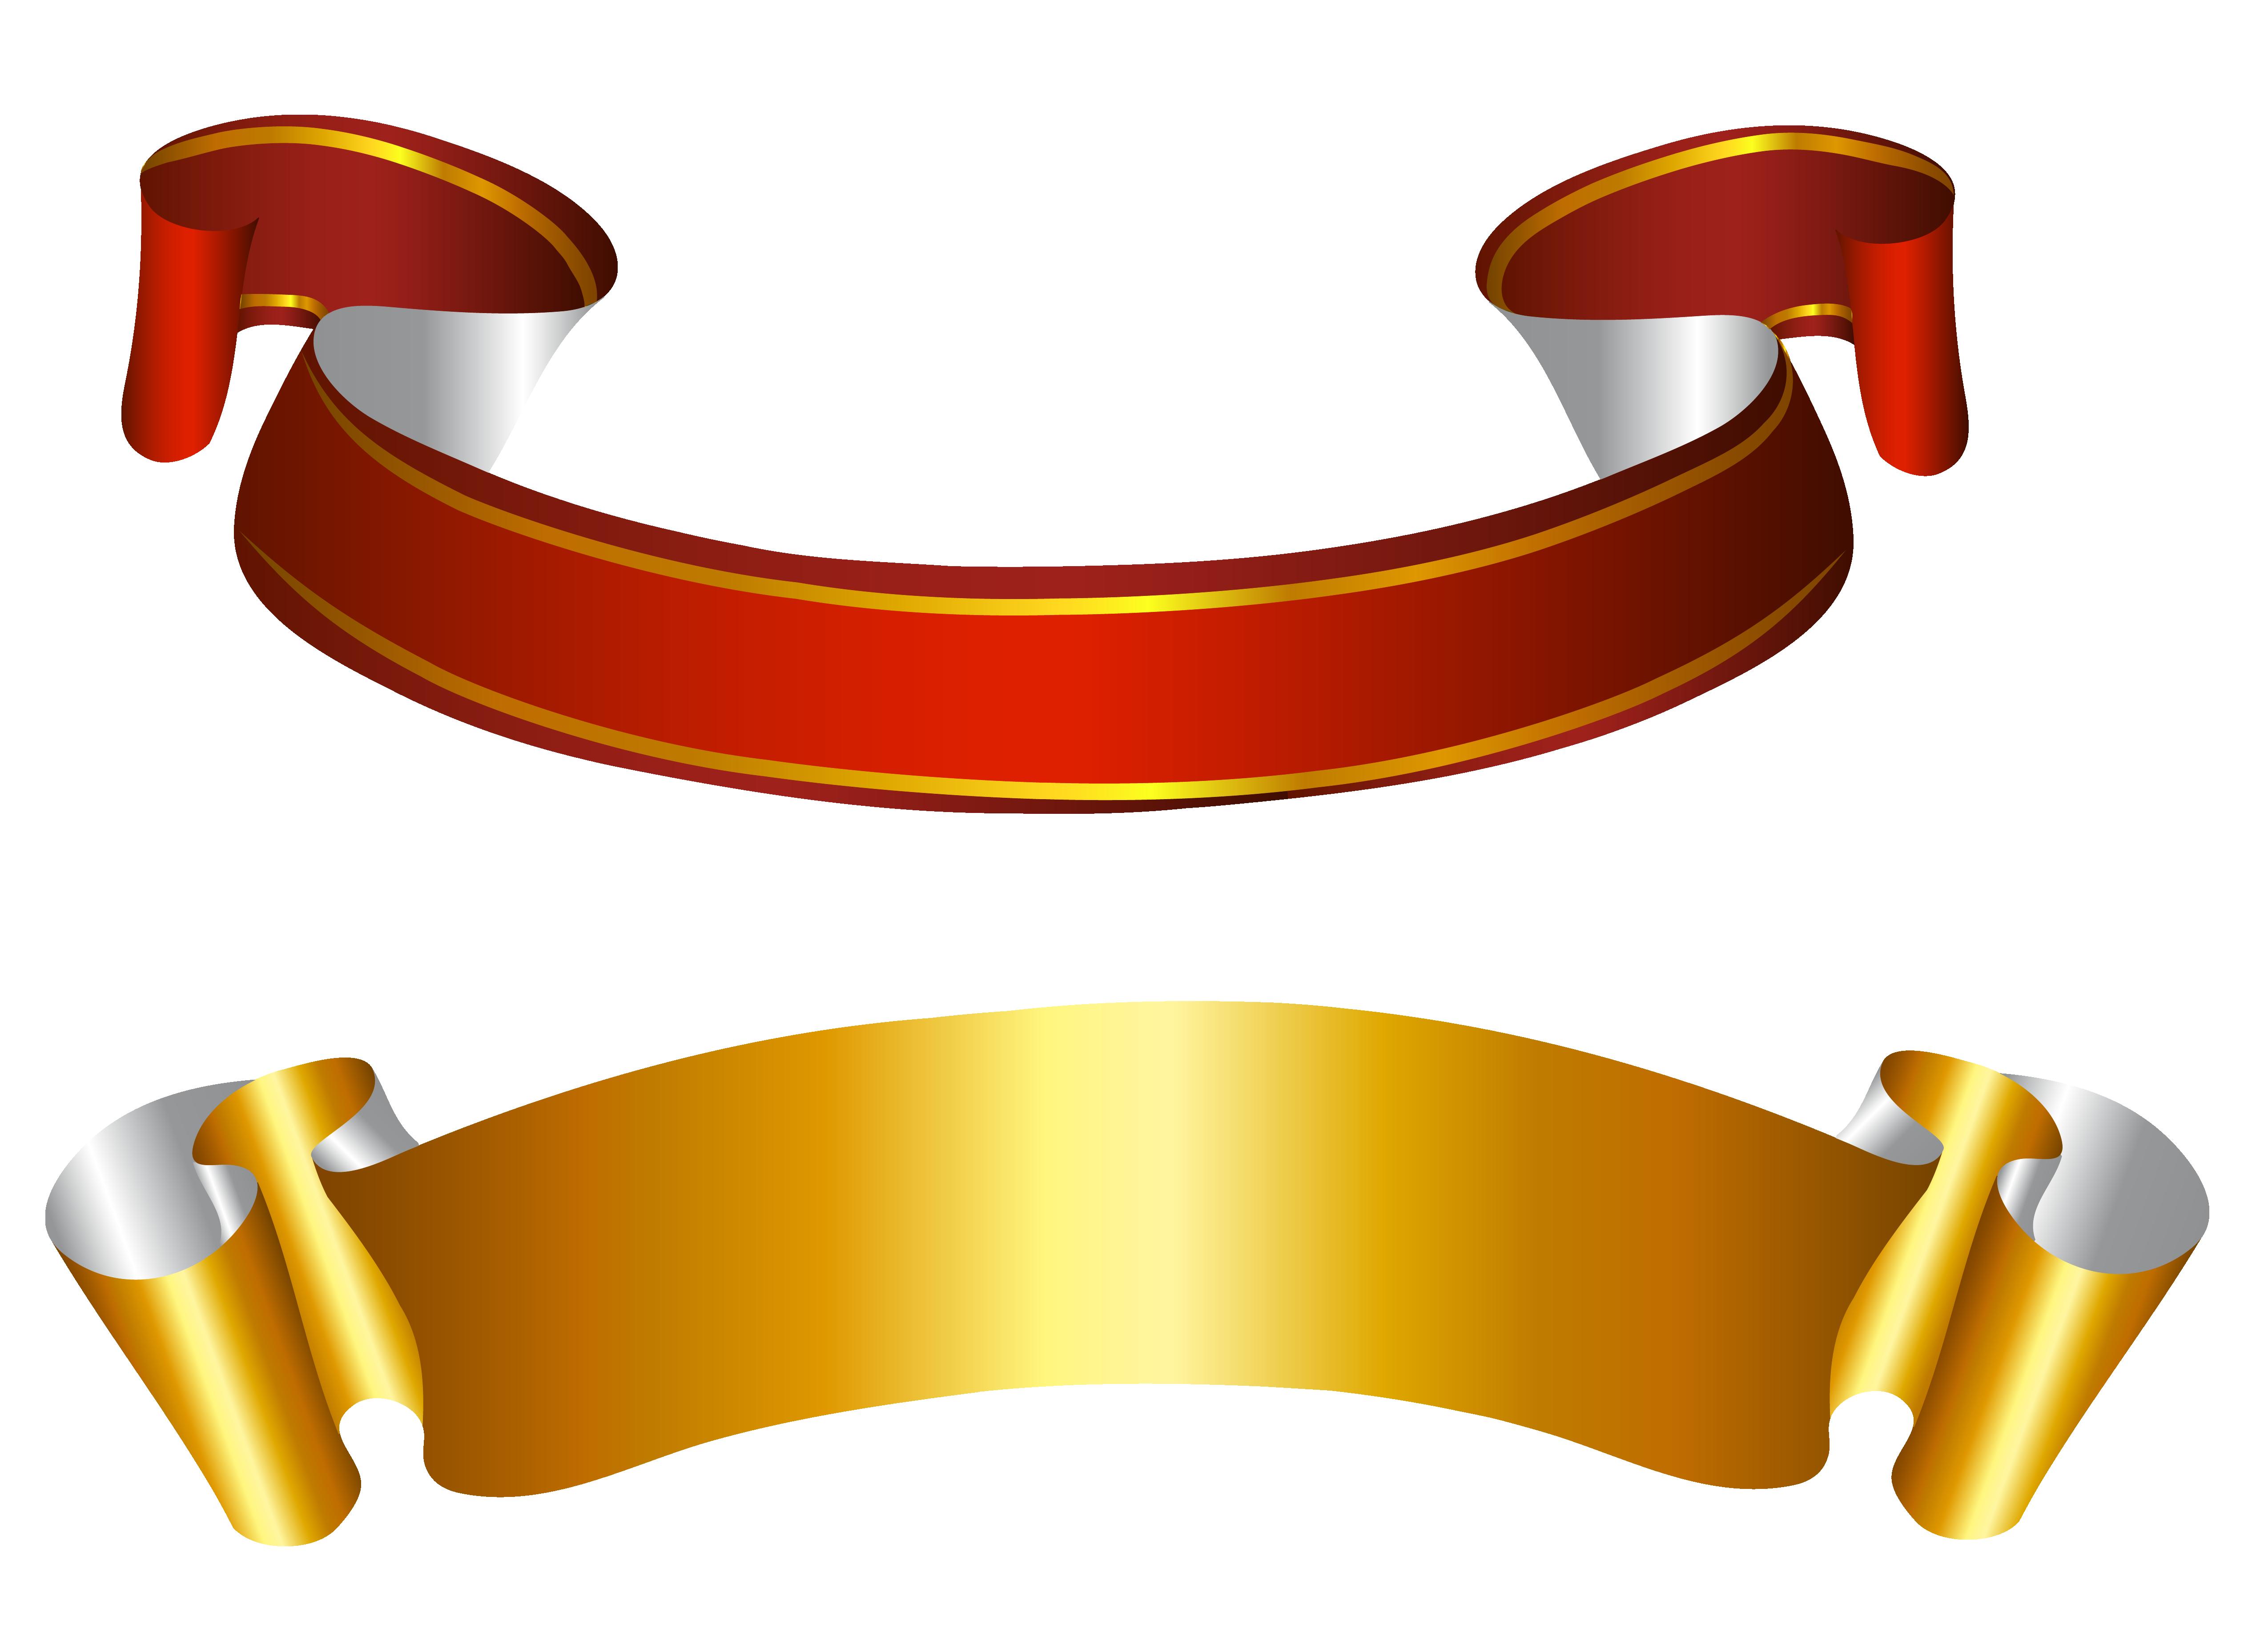 Ribbon Vector PNG - Cliparts.co